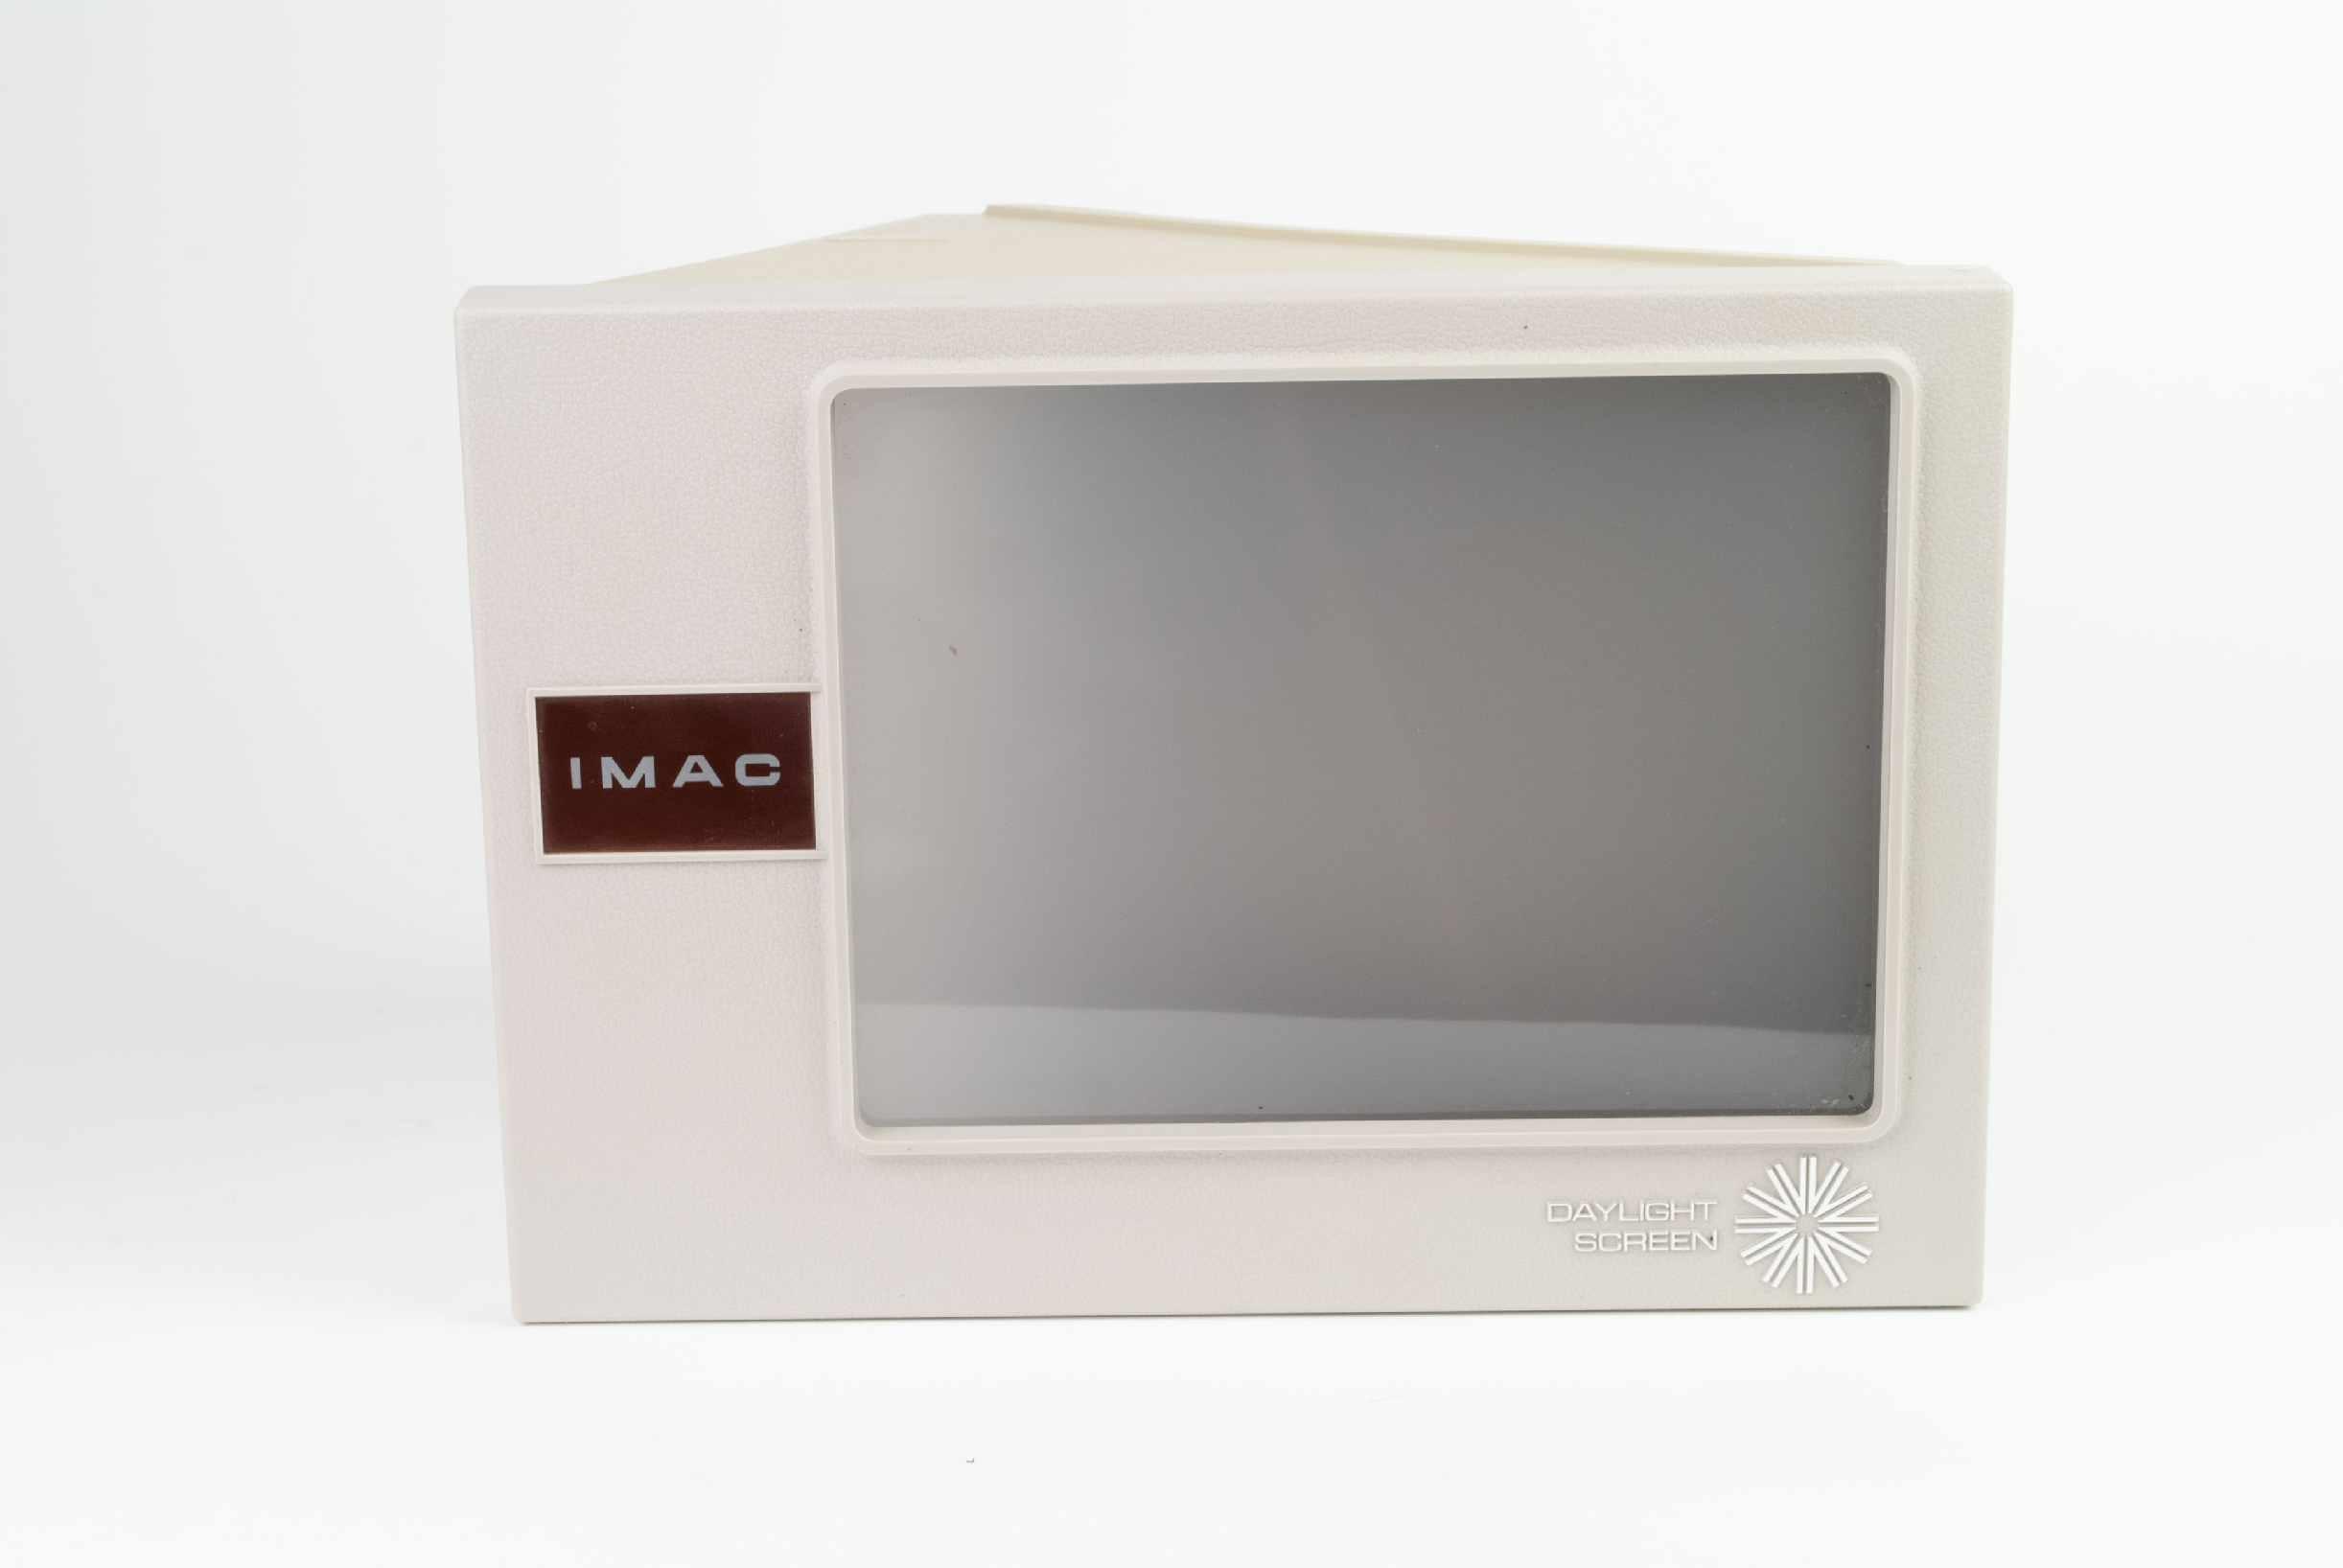 Imac Daylight Screen (used)